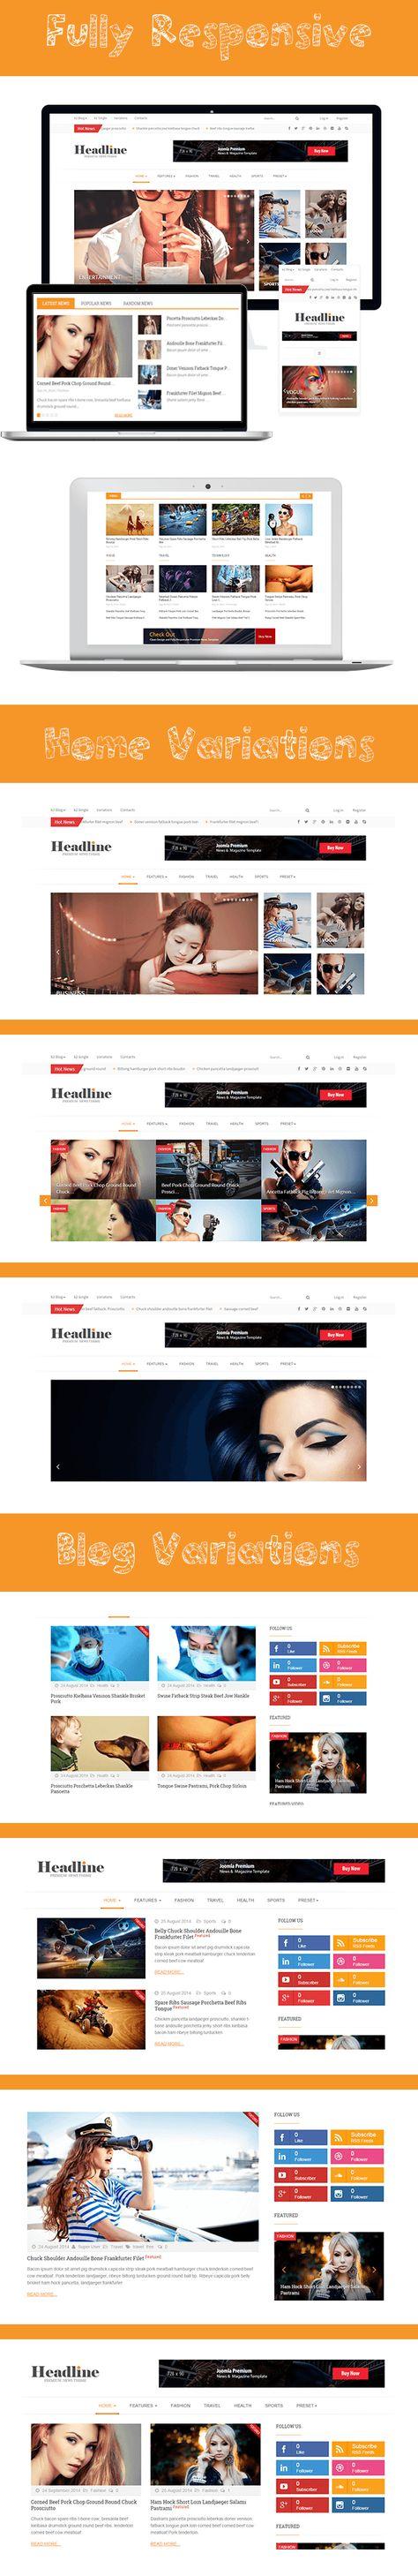 Headline - Responsive Joomla News, Magazine, Blog